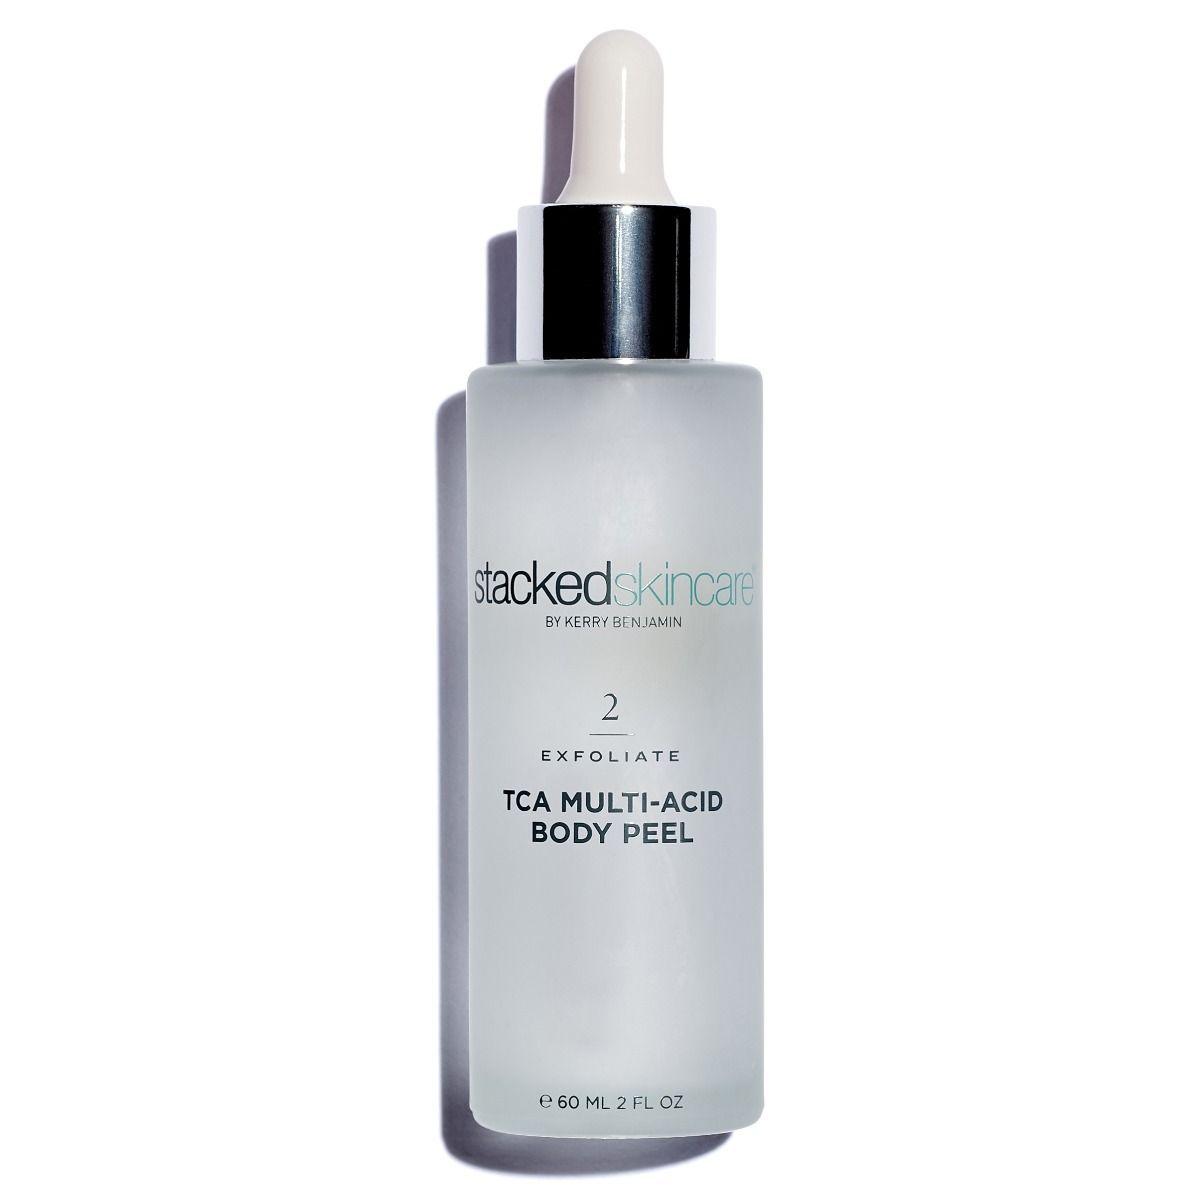 Translucent skincare dropper bottle on a white background.